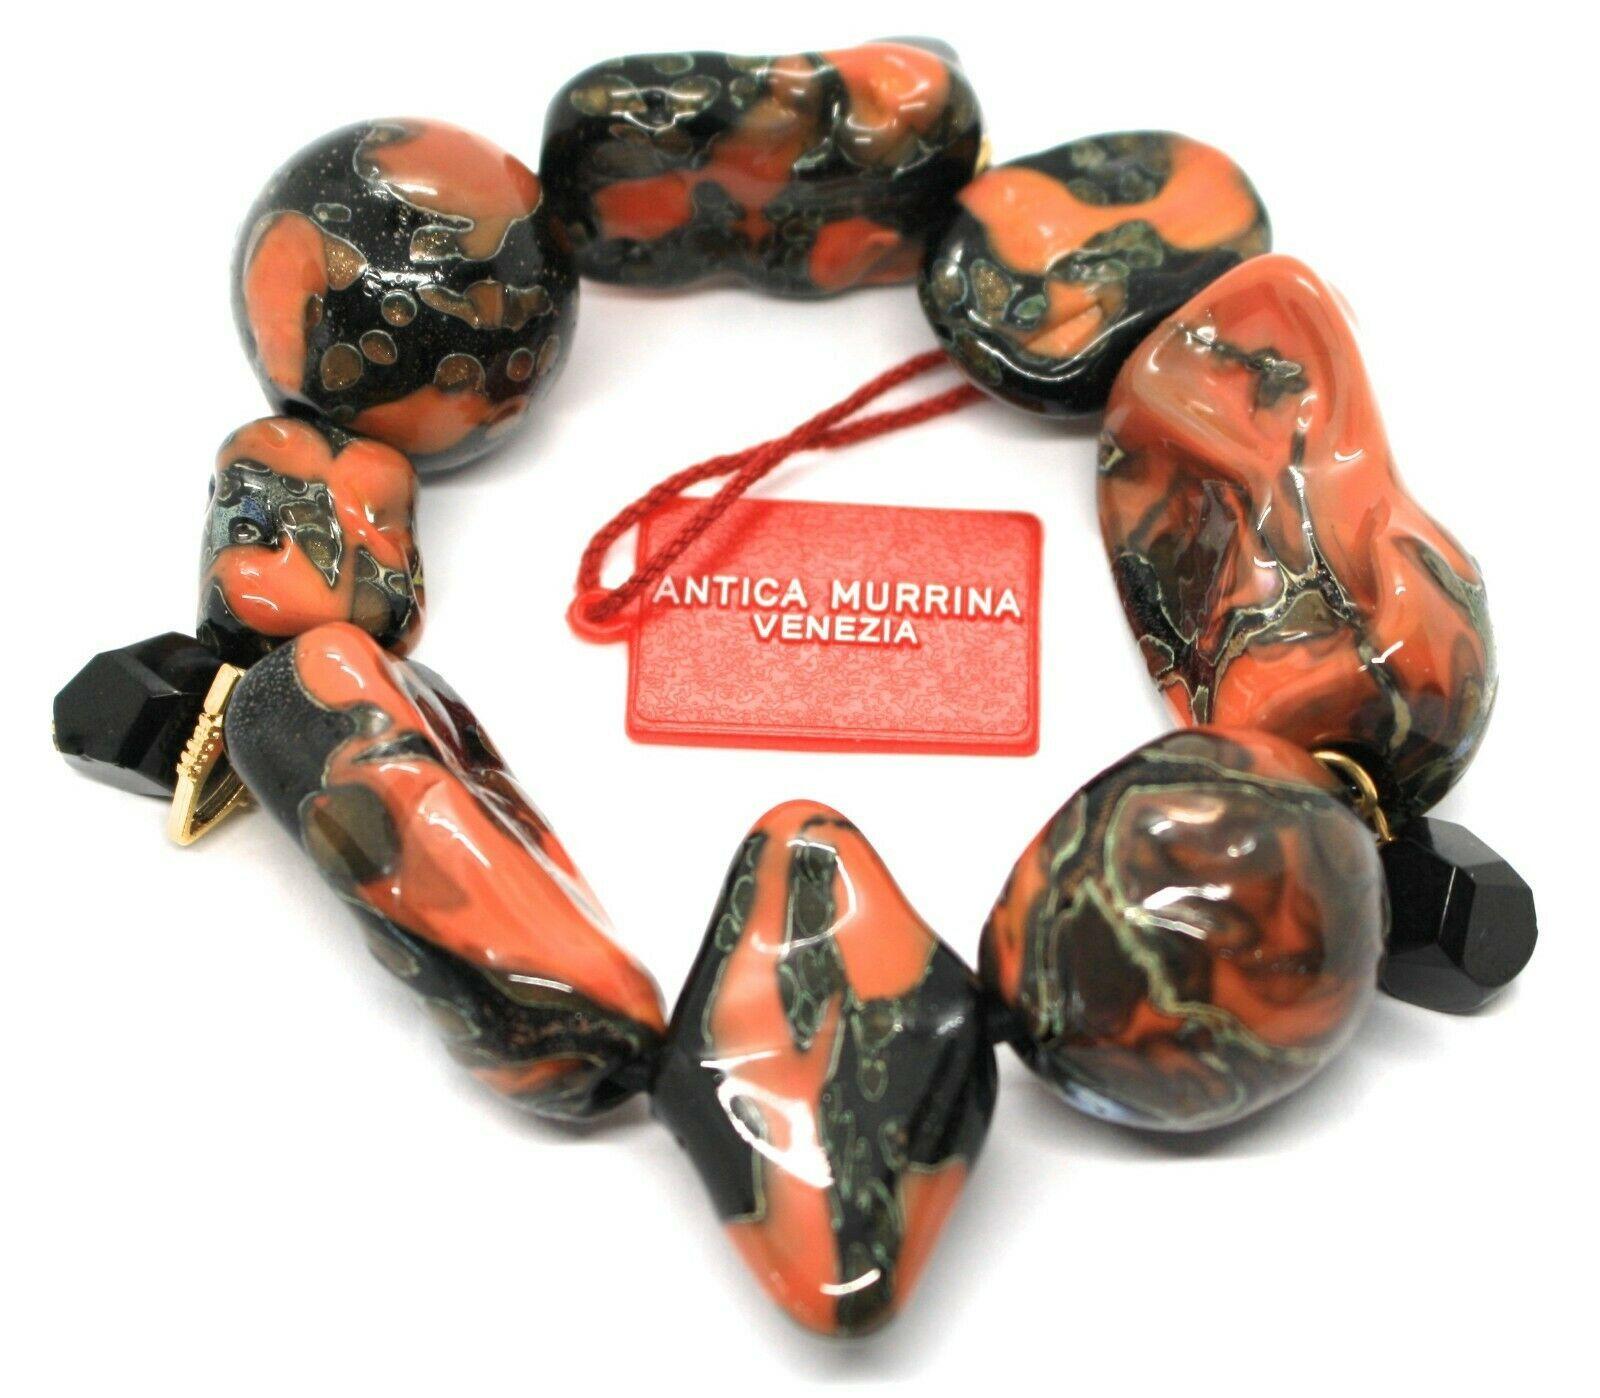 Bracelet Antica Murrina Venezia, Murano, Inserted Large, Red Black, Elastic